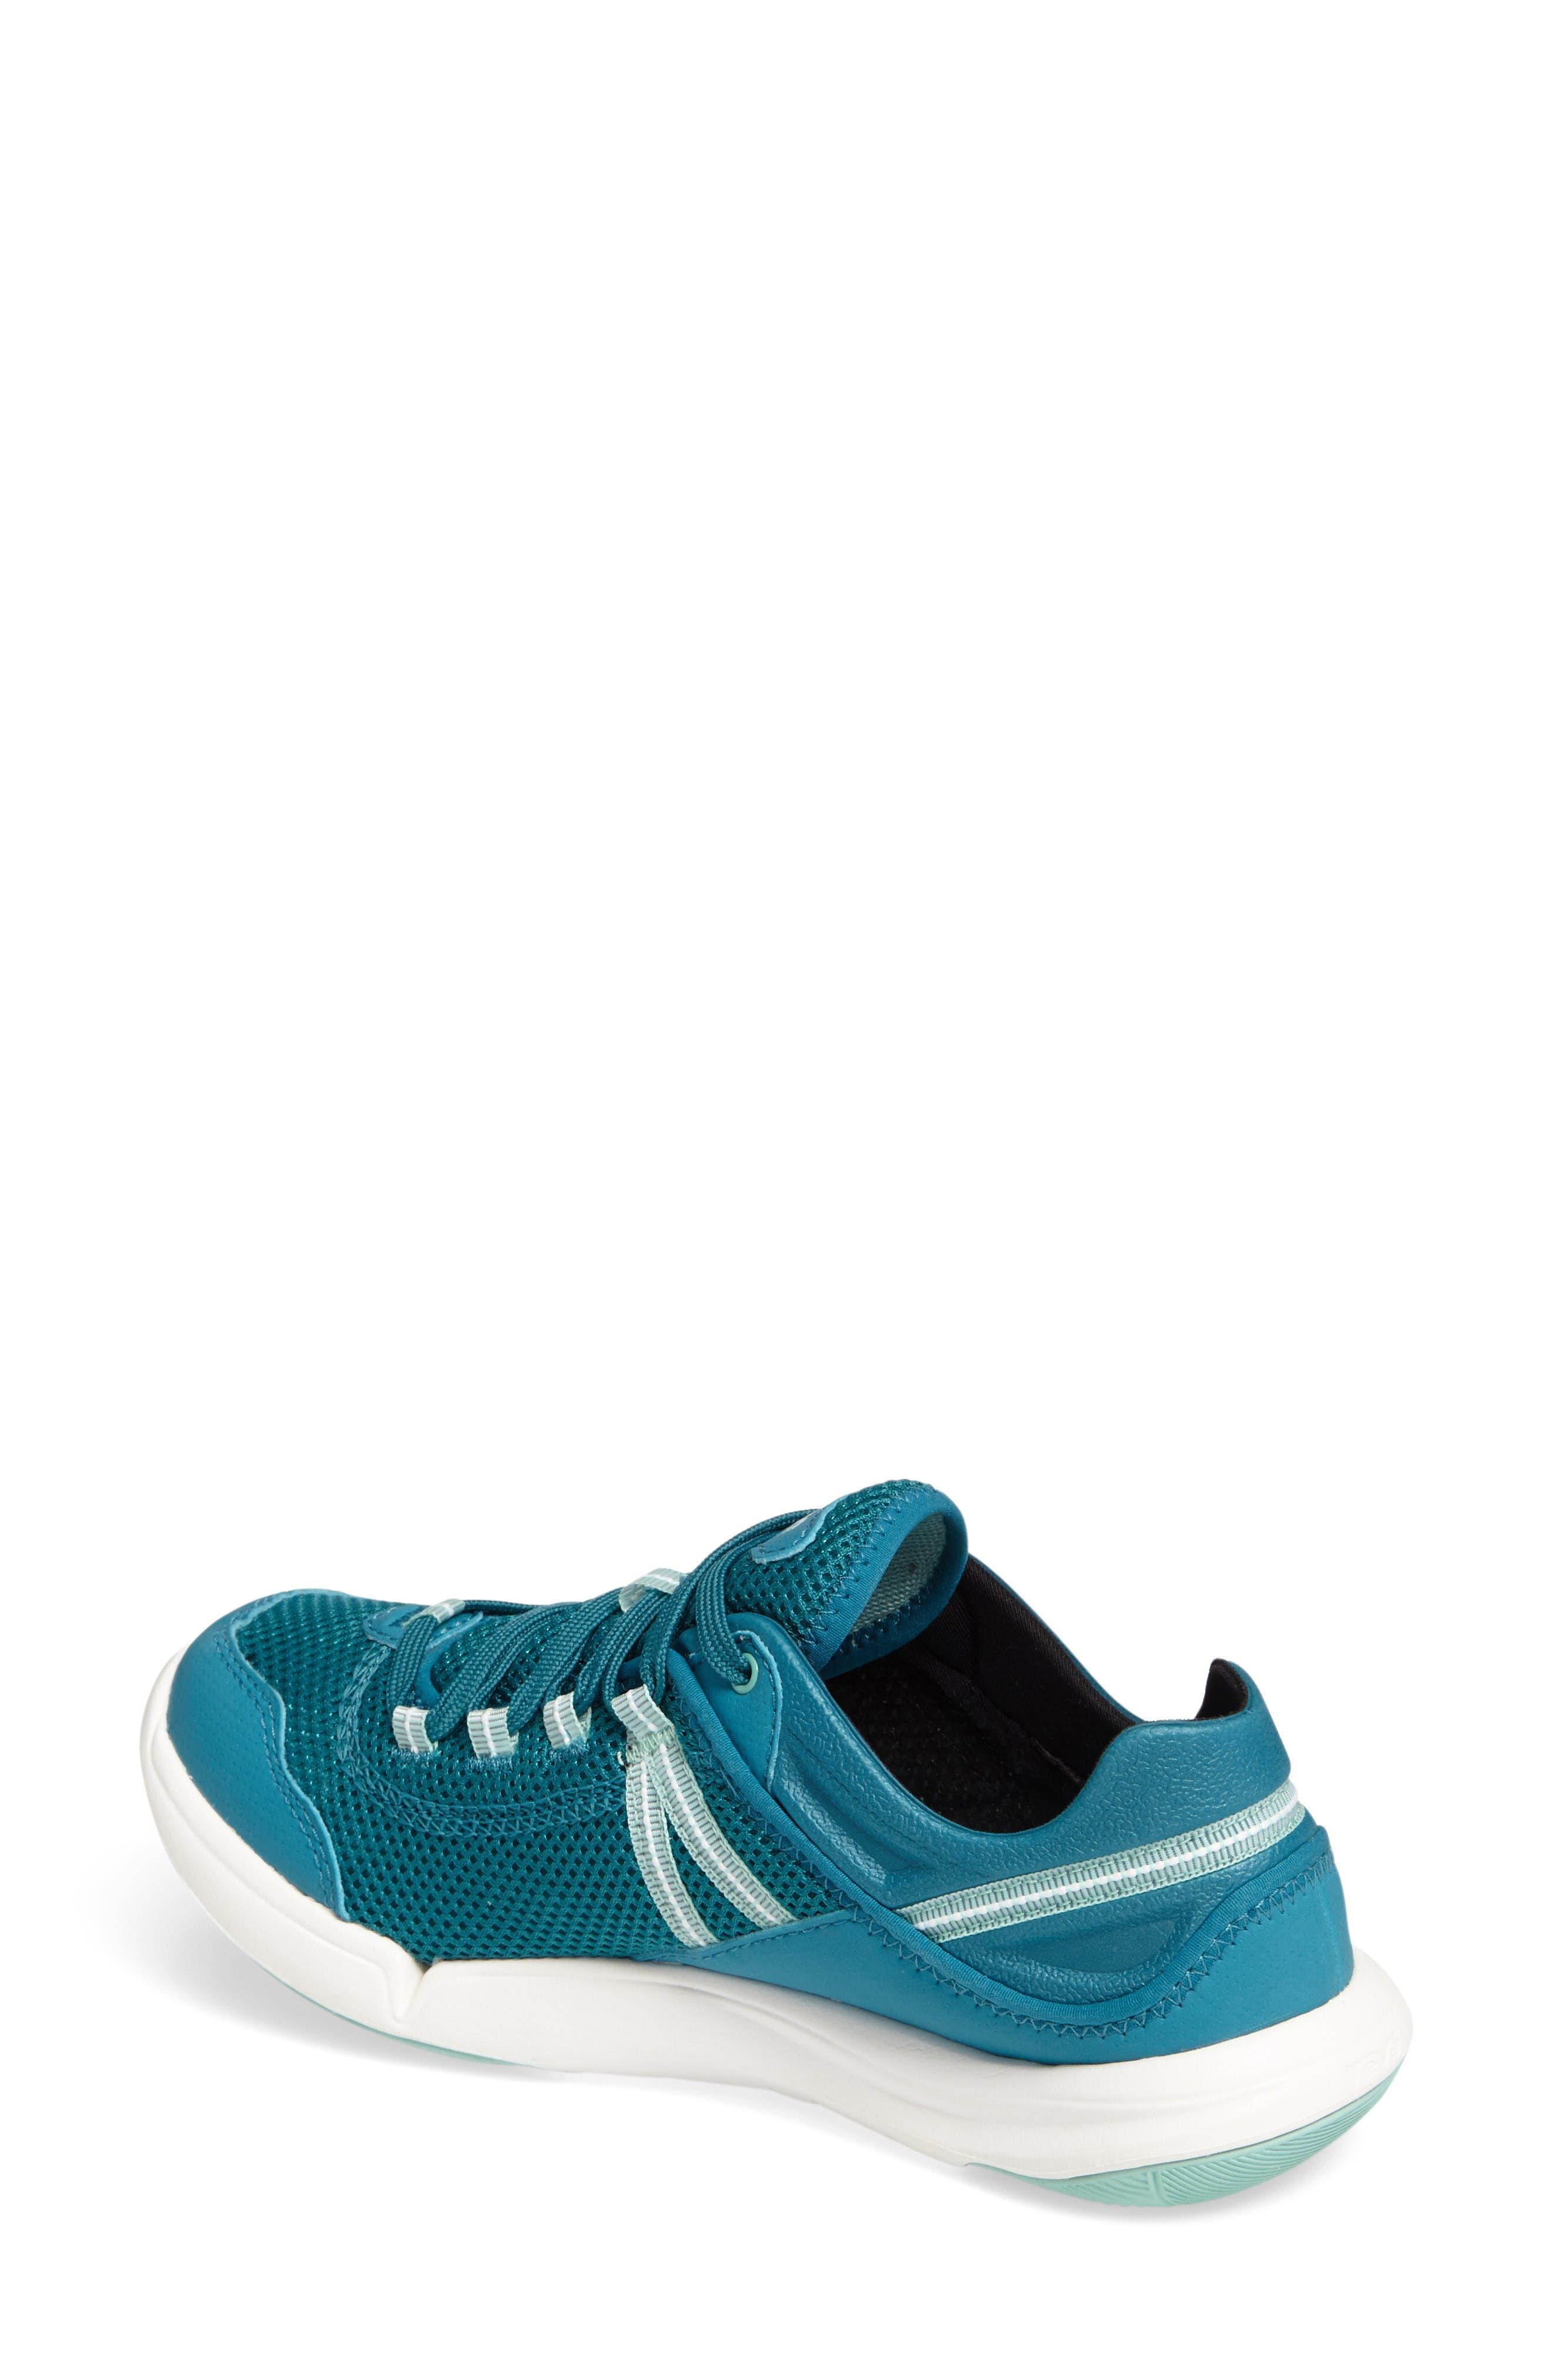 Evo Sneaker,                             Alternate thumbnail 2, color,                             Blue Fabric